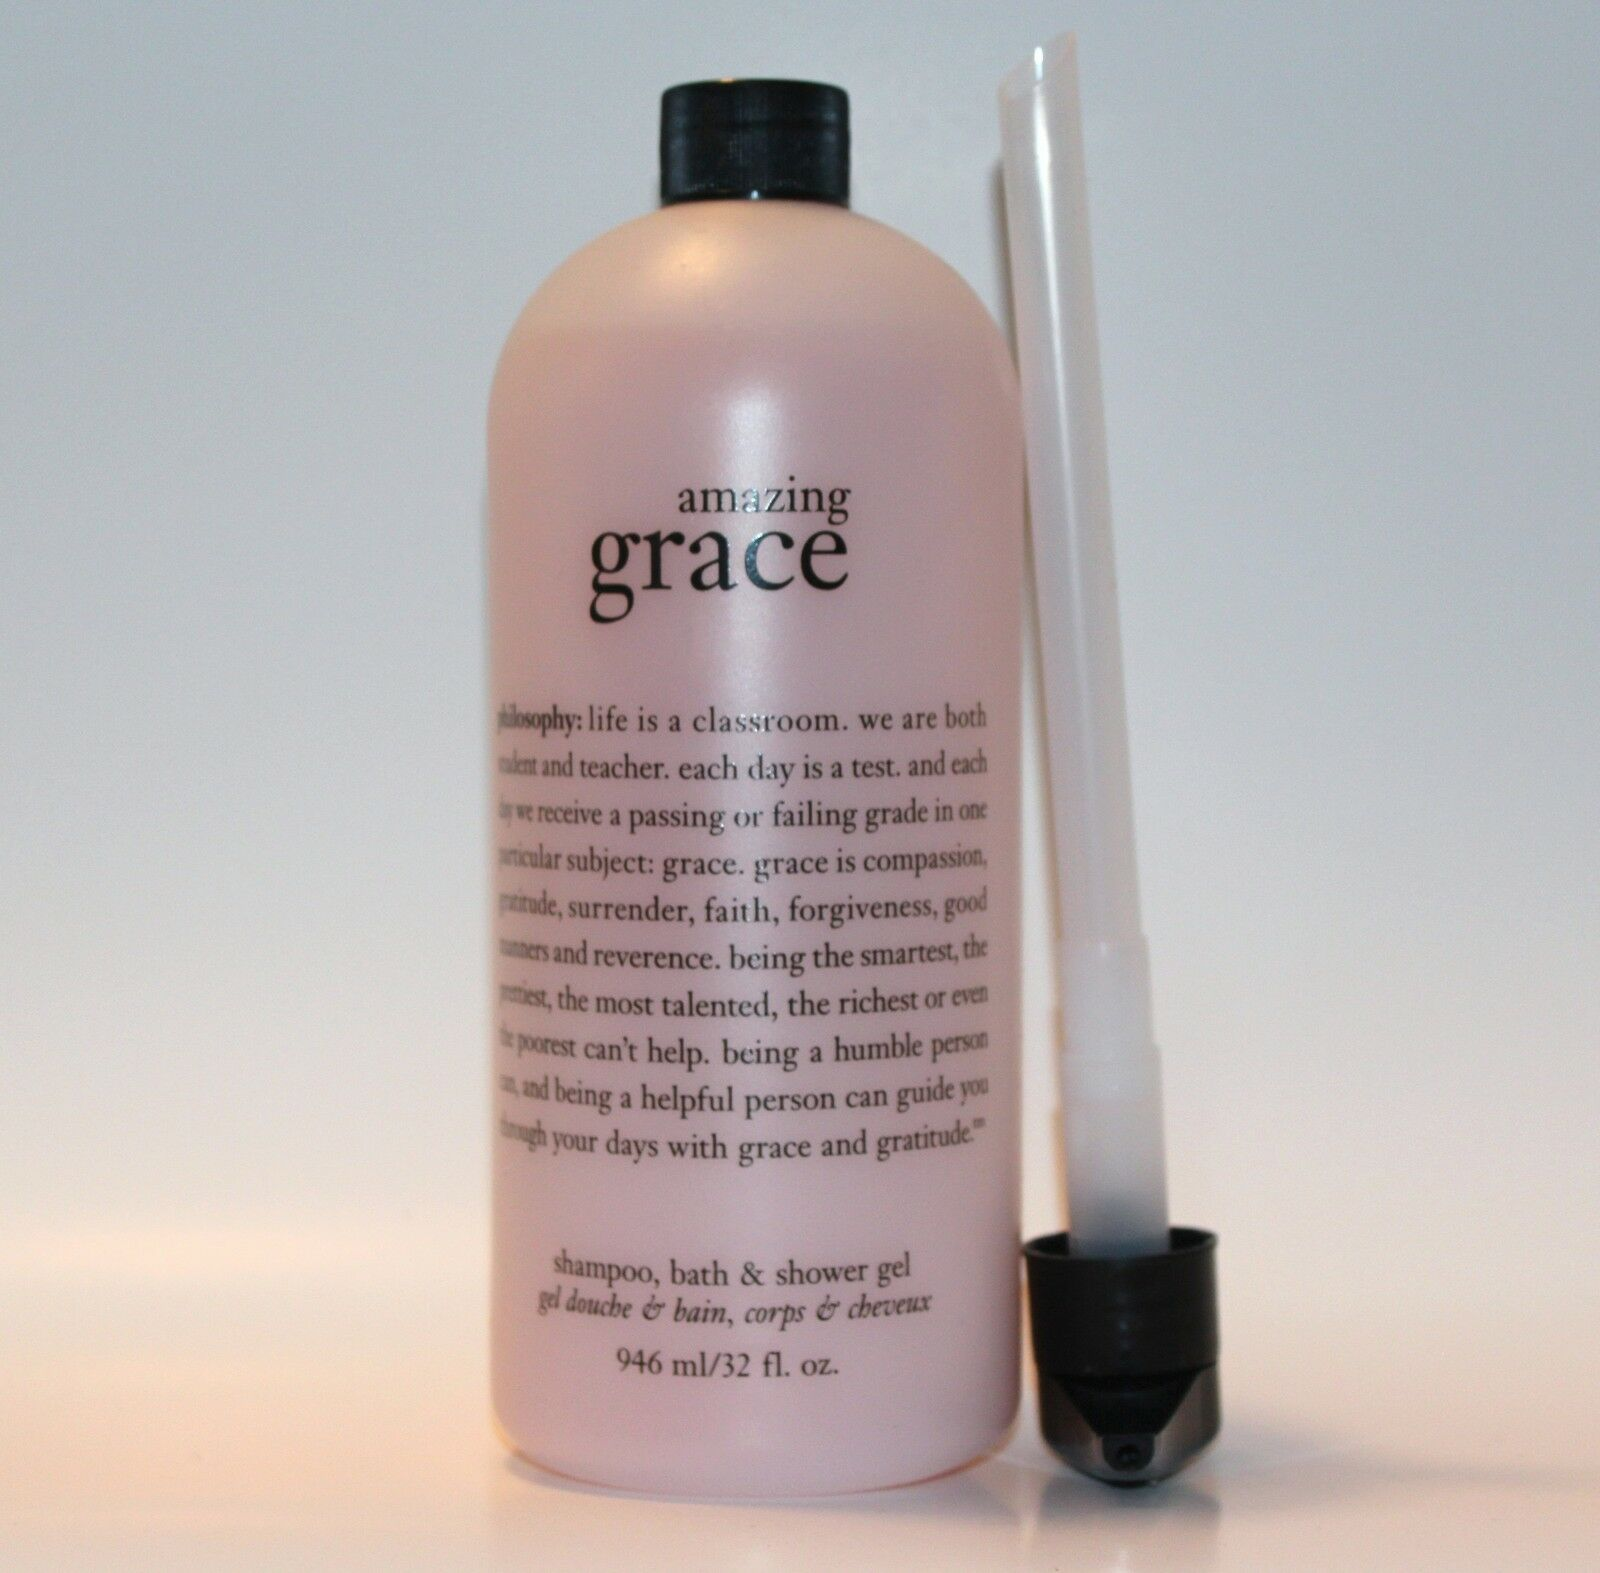 philosophy shower gel philosophy shower gel philosophy amazing grace shampoo bath shower gel 32 oz new with pump